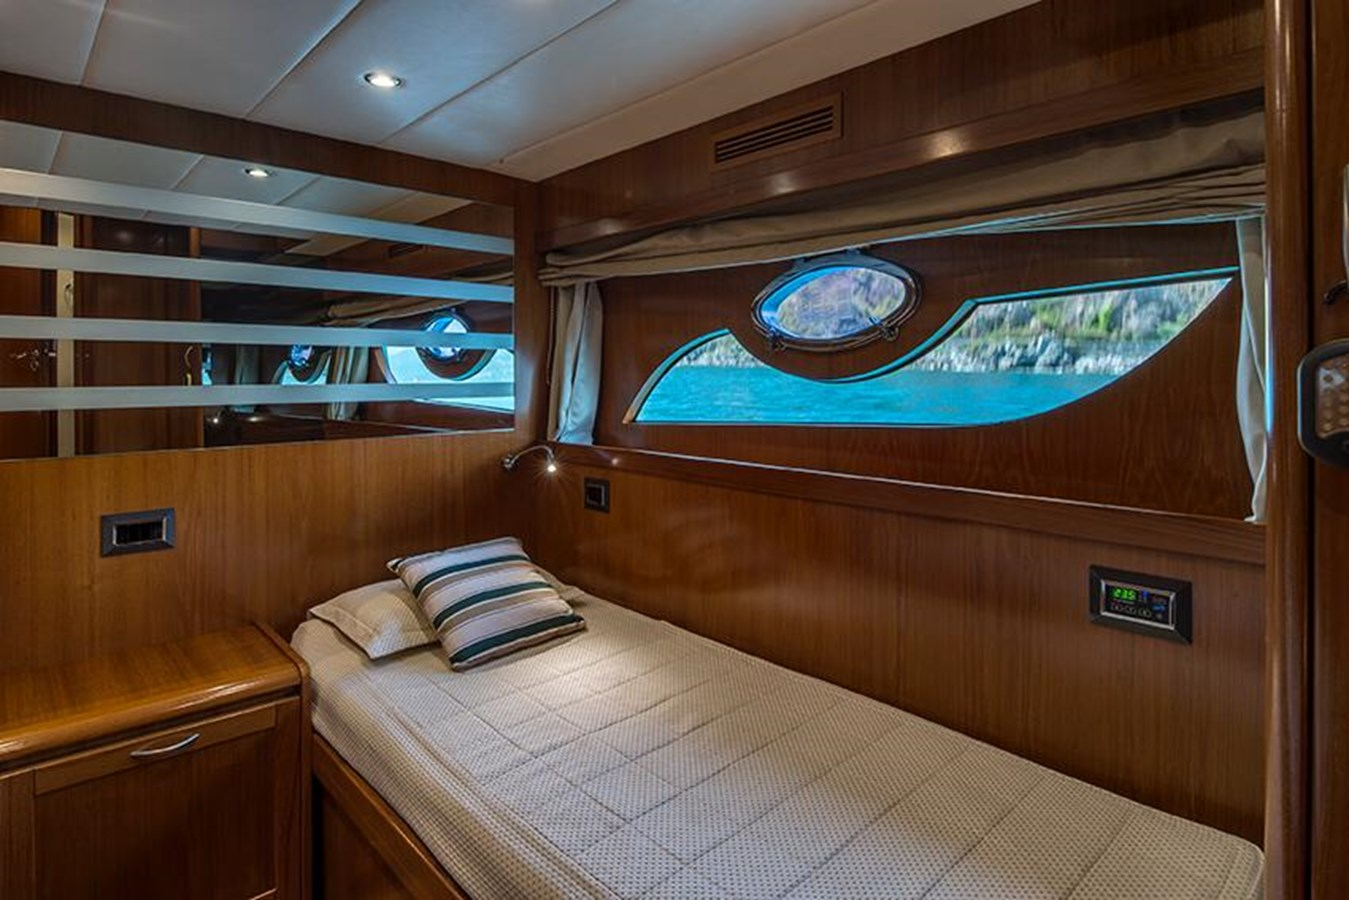 IMG-20200304-WA0009 2011 ABATI YACHTS kEYPORT 60 Motor Yacht 2879769